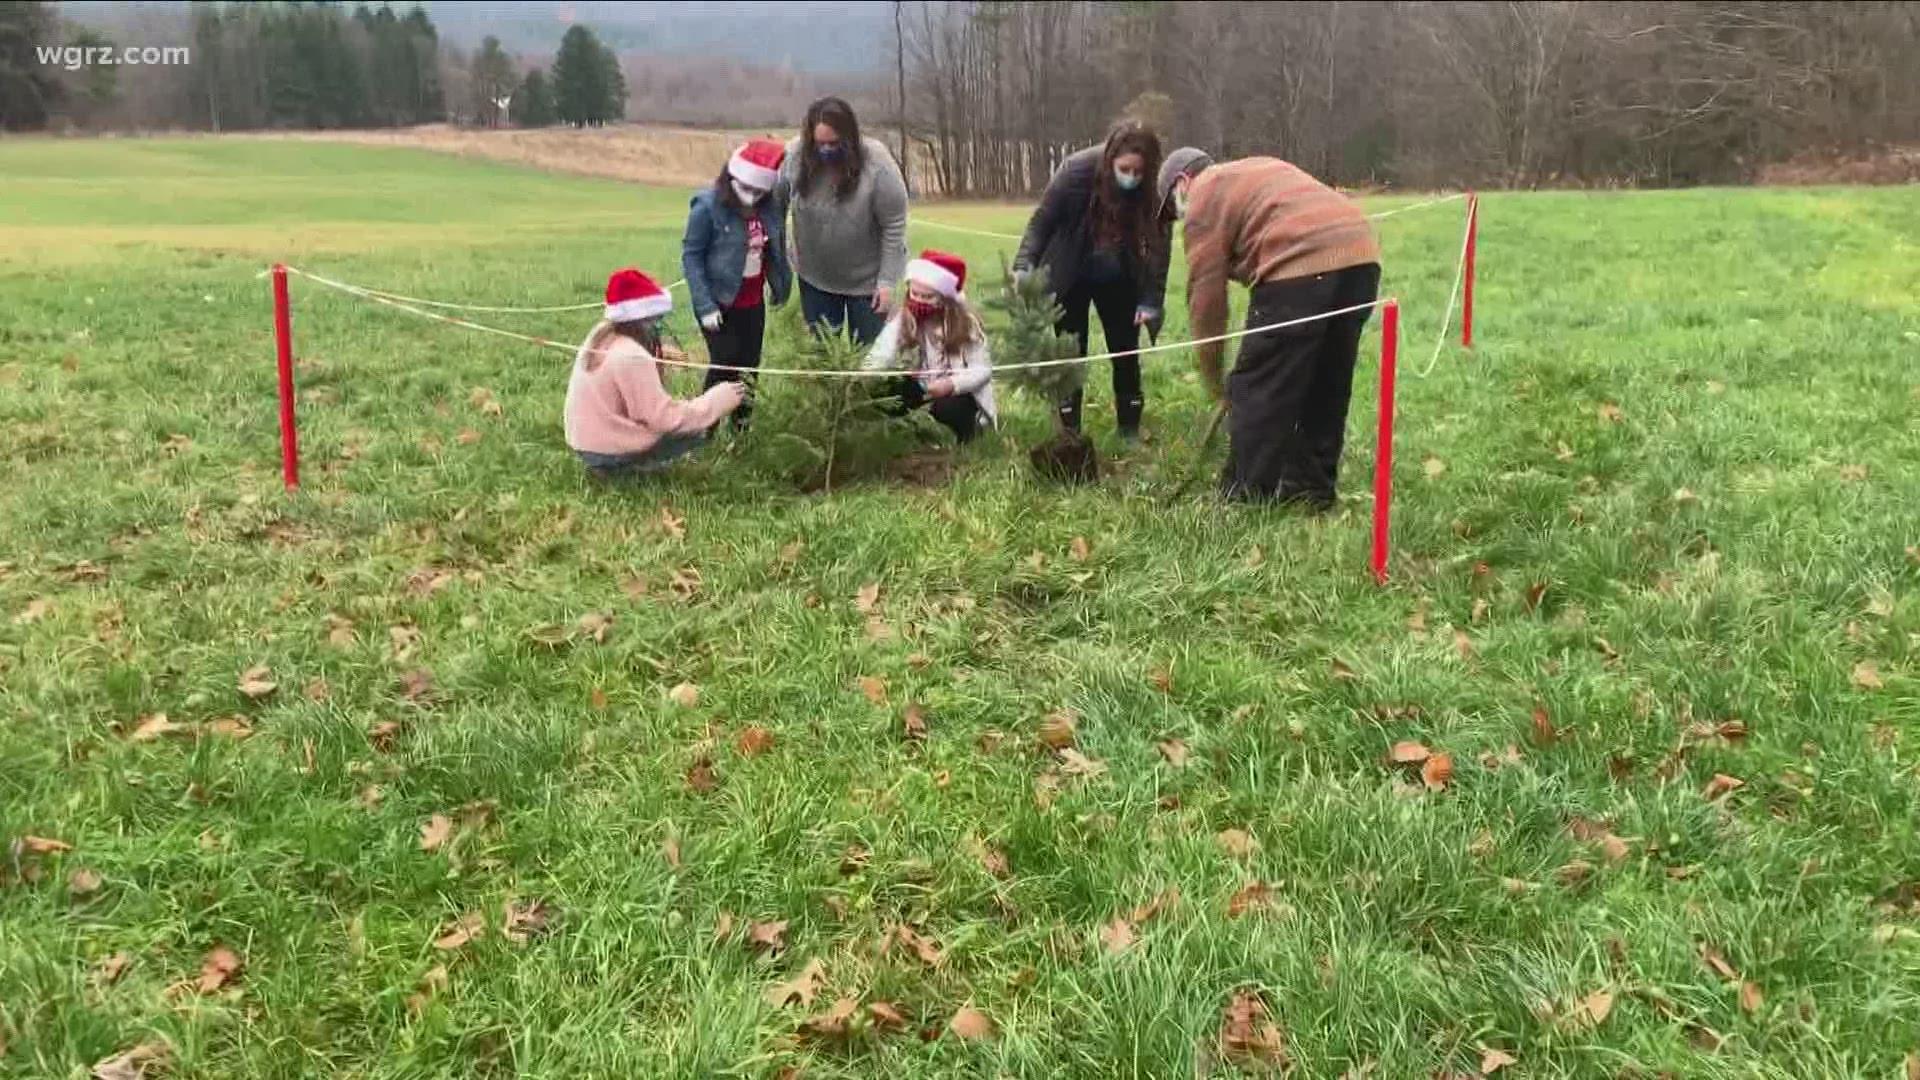 Plant-your-own Christmas tree farm opens in Boston, NY | wgrz.com